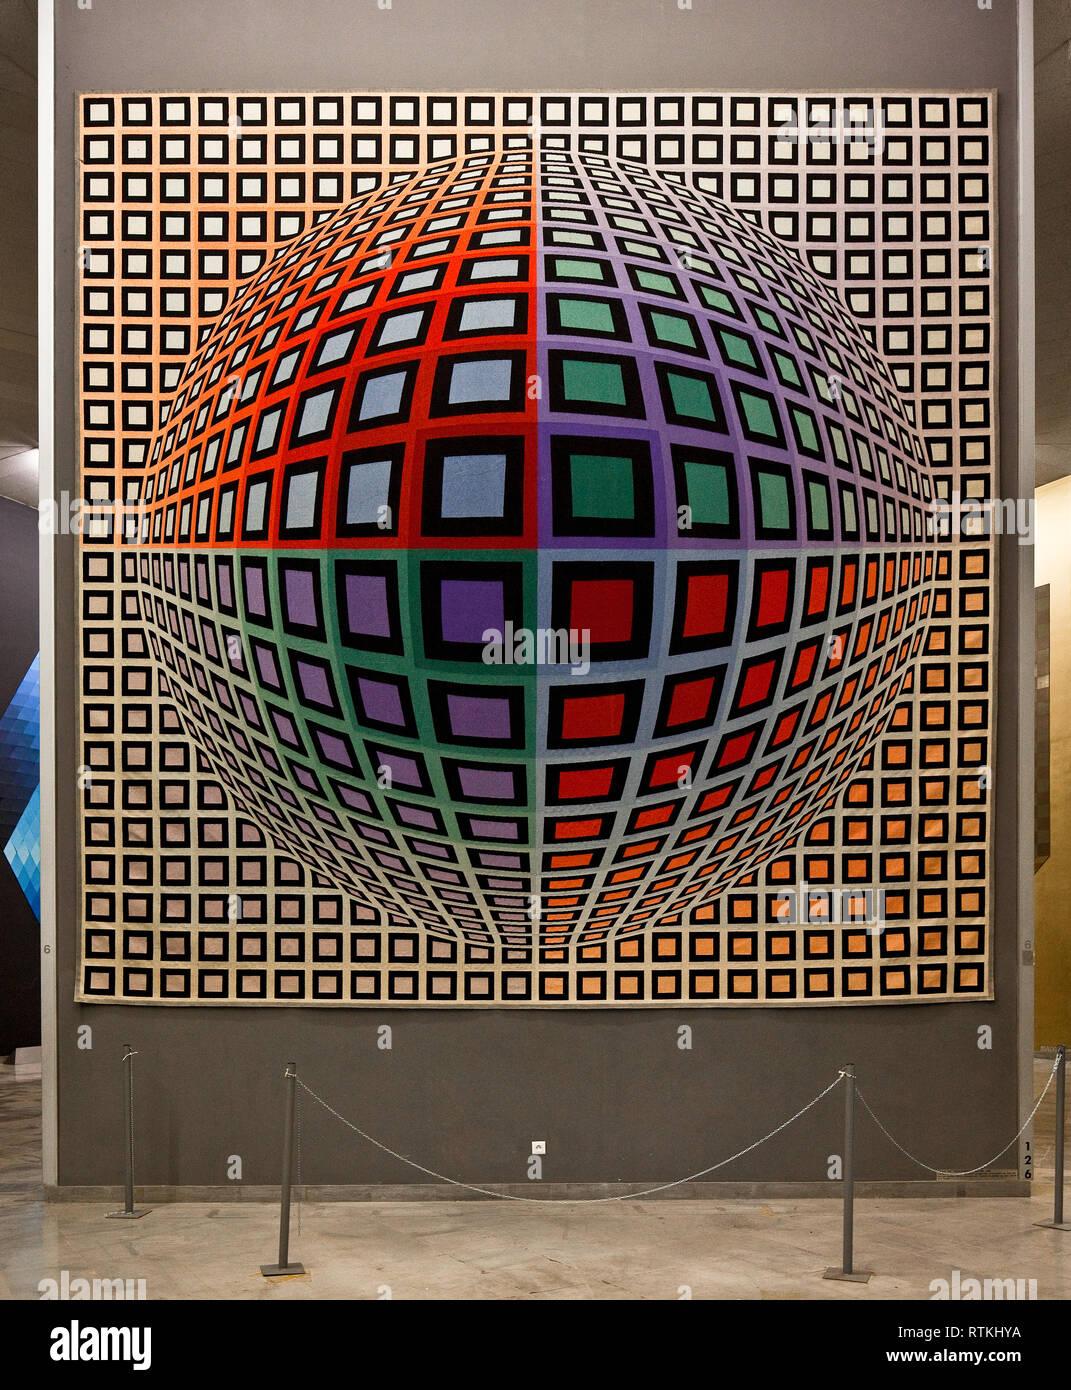 Frankr Aix-en-Provence VASARELY-Museum 60971 raumillusionistische textile Op-Art - Wandinstallation um 1975 Objekt Nr 126  6 m breit 6 m hoch - Stock Image